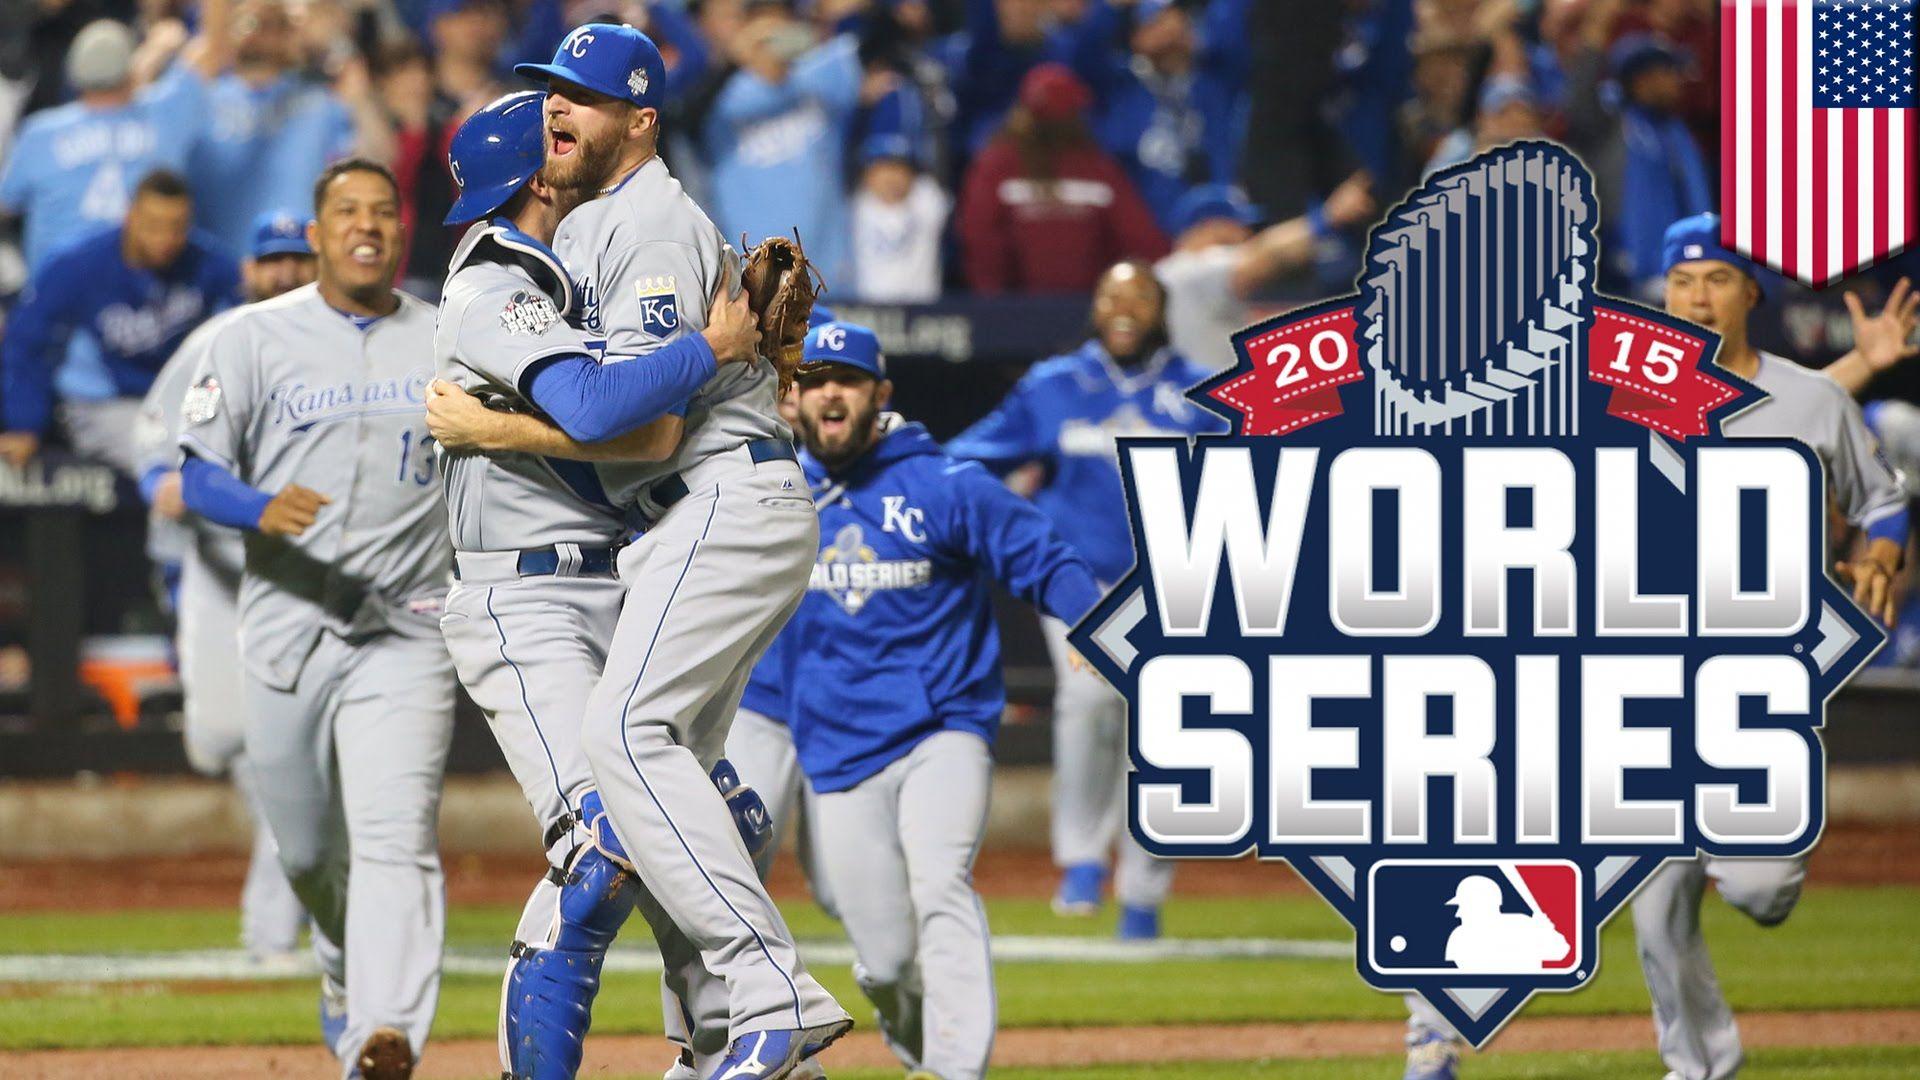 Giants vs Royals World Series